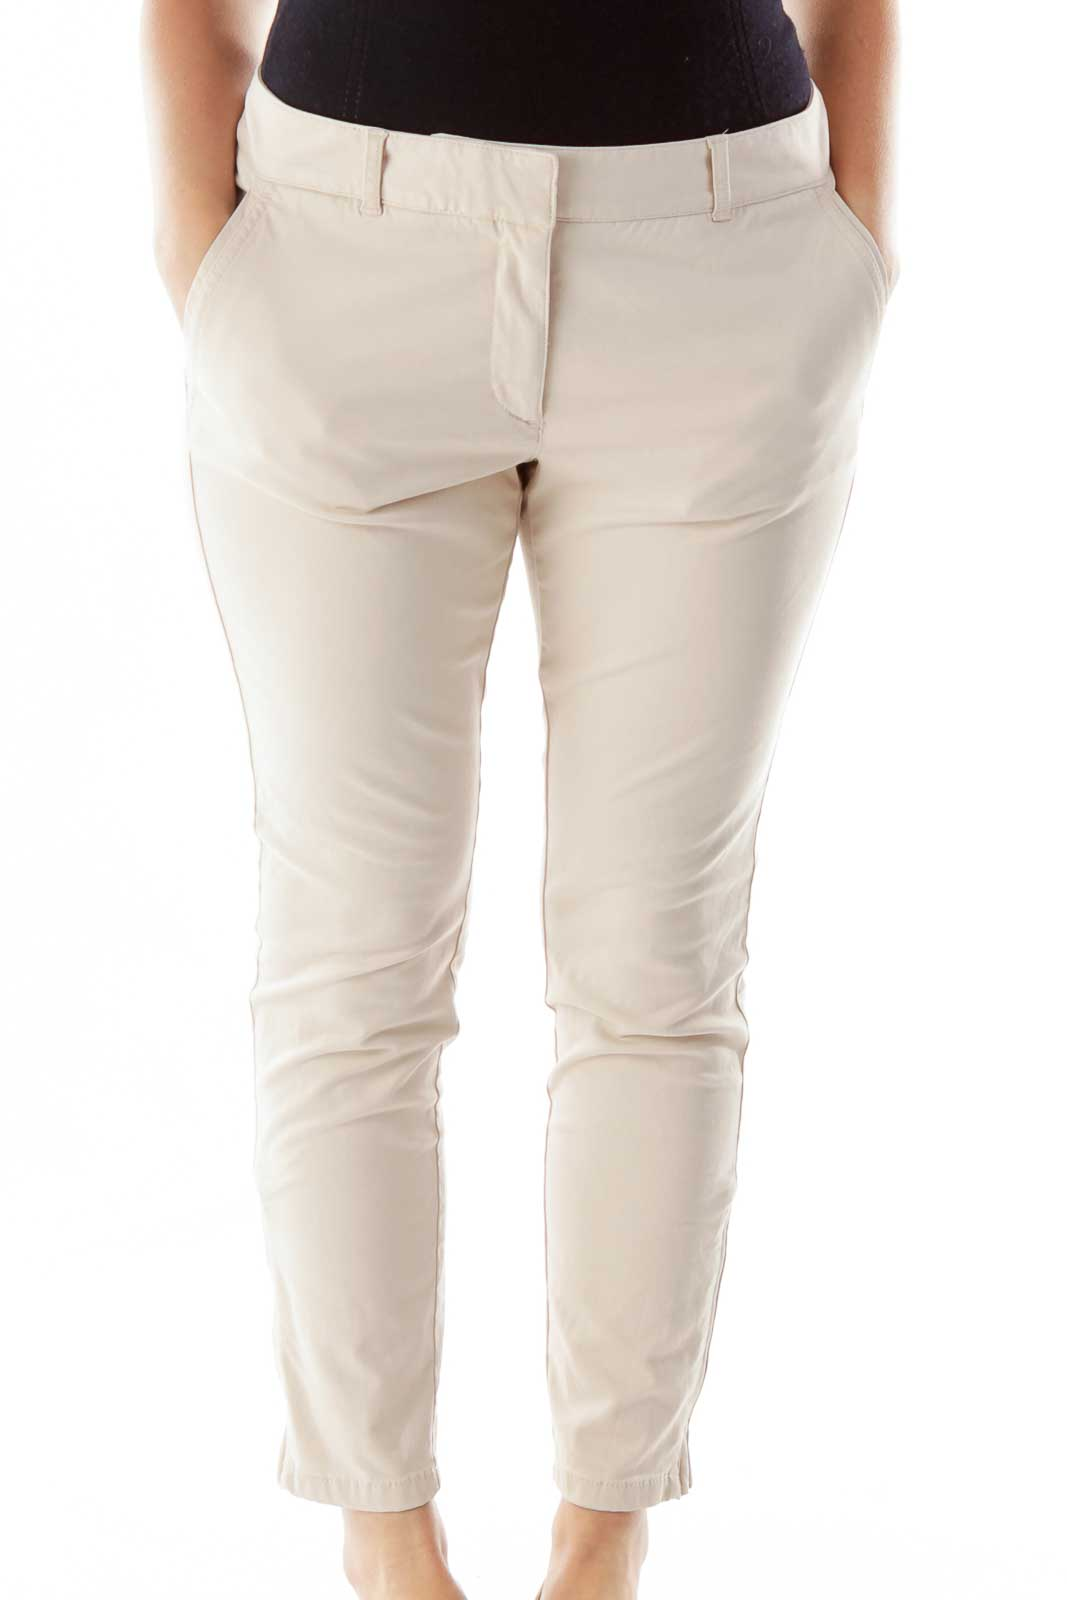 Baby Pink Skinny Pants